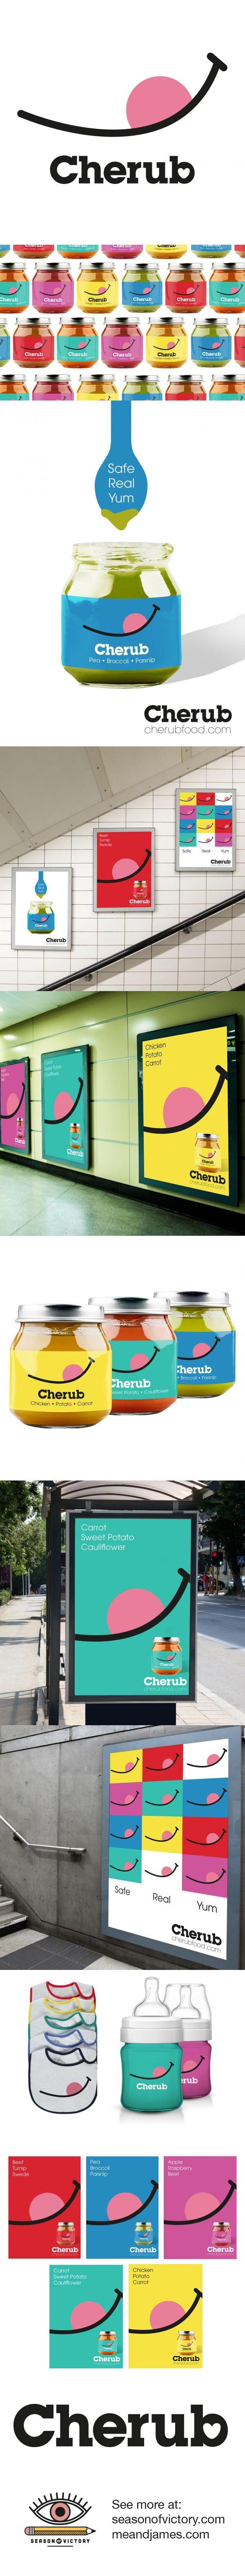 Cherub Baby Food - Packaging, Branding, Advertisment & Logo. Working with meandjames.com, we created the logo, branding, packaging design and advertisment campaign for the brand. #logo #design #graphicdesign #artdirection #packaging #foodpackaging #colorf